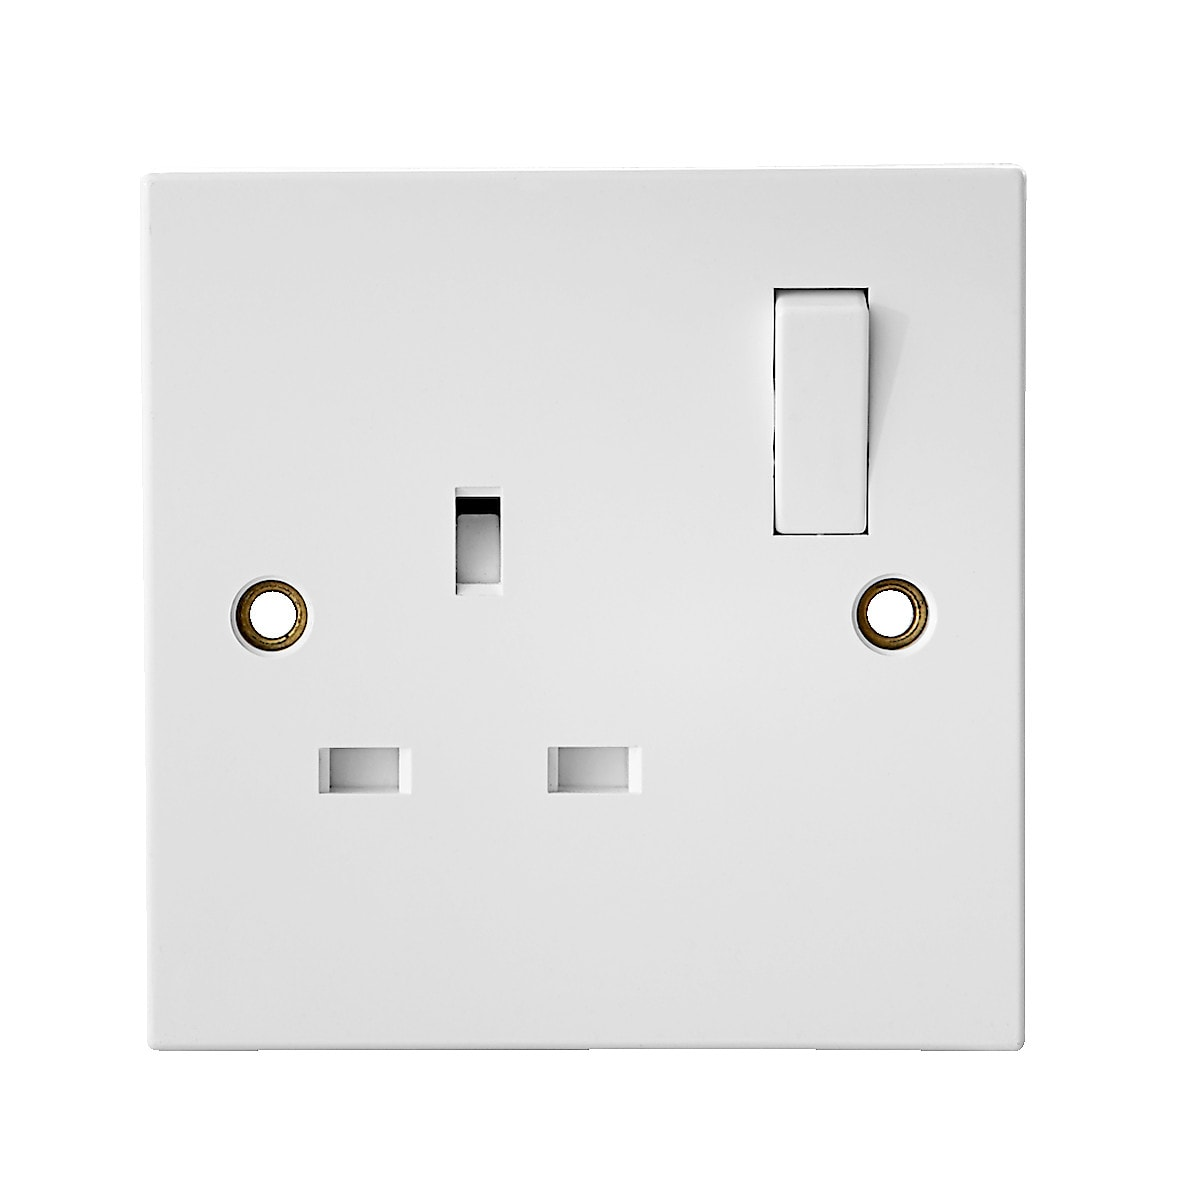 Cotech Switched Sockets 13 A